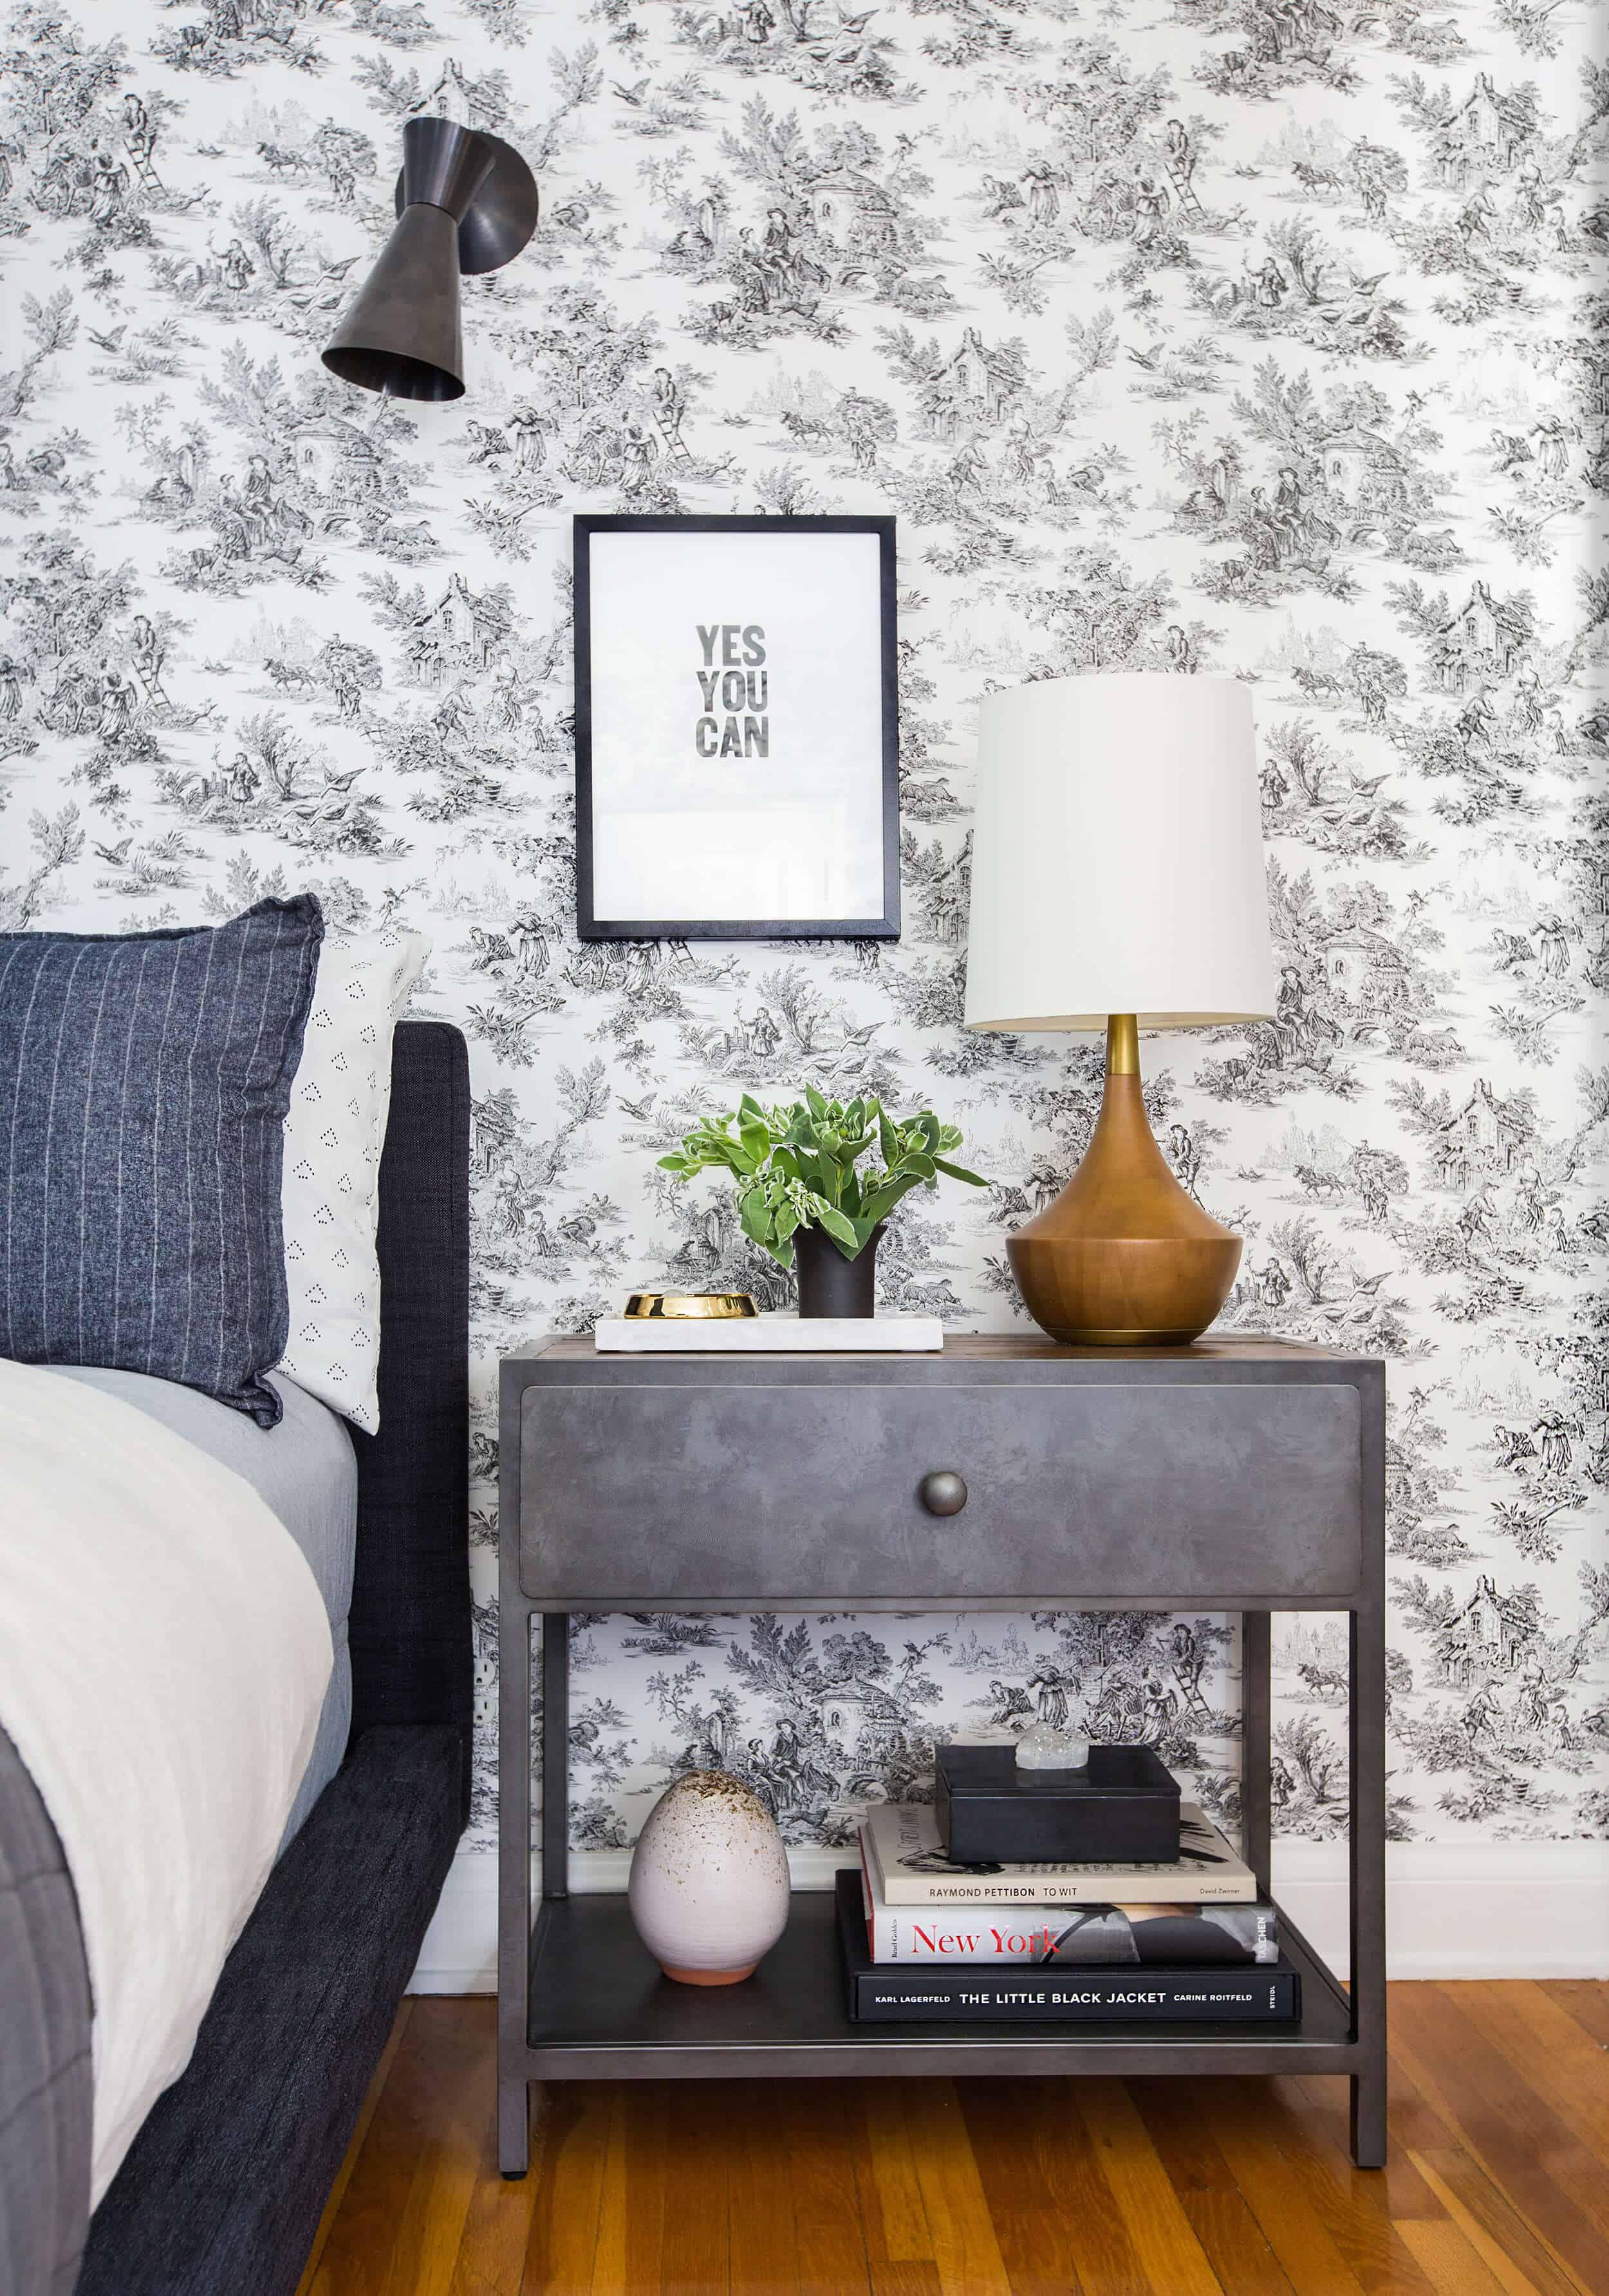 Guest Bedroom_Traditional Eclectic_Industrial_Modern_Toile_Wallpaper_Sneak Peek